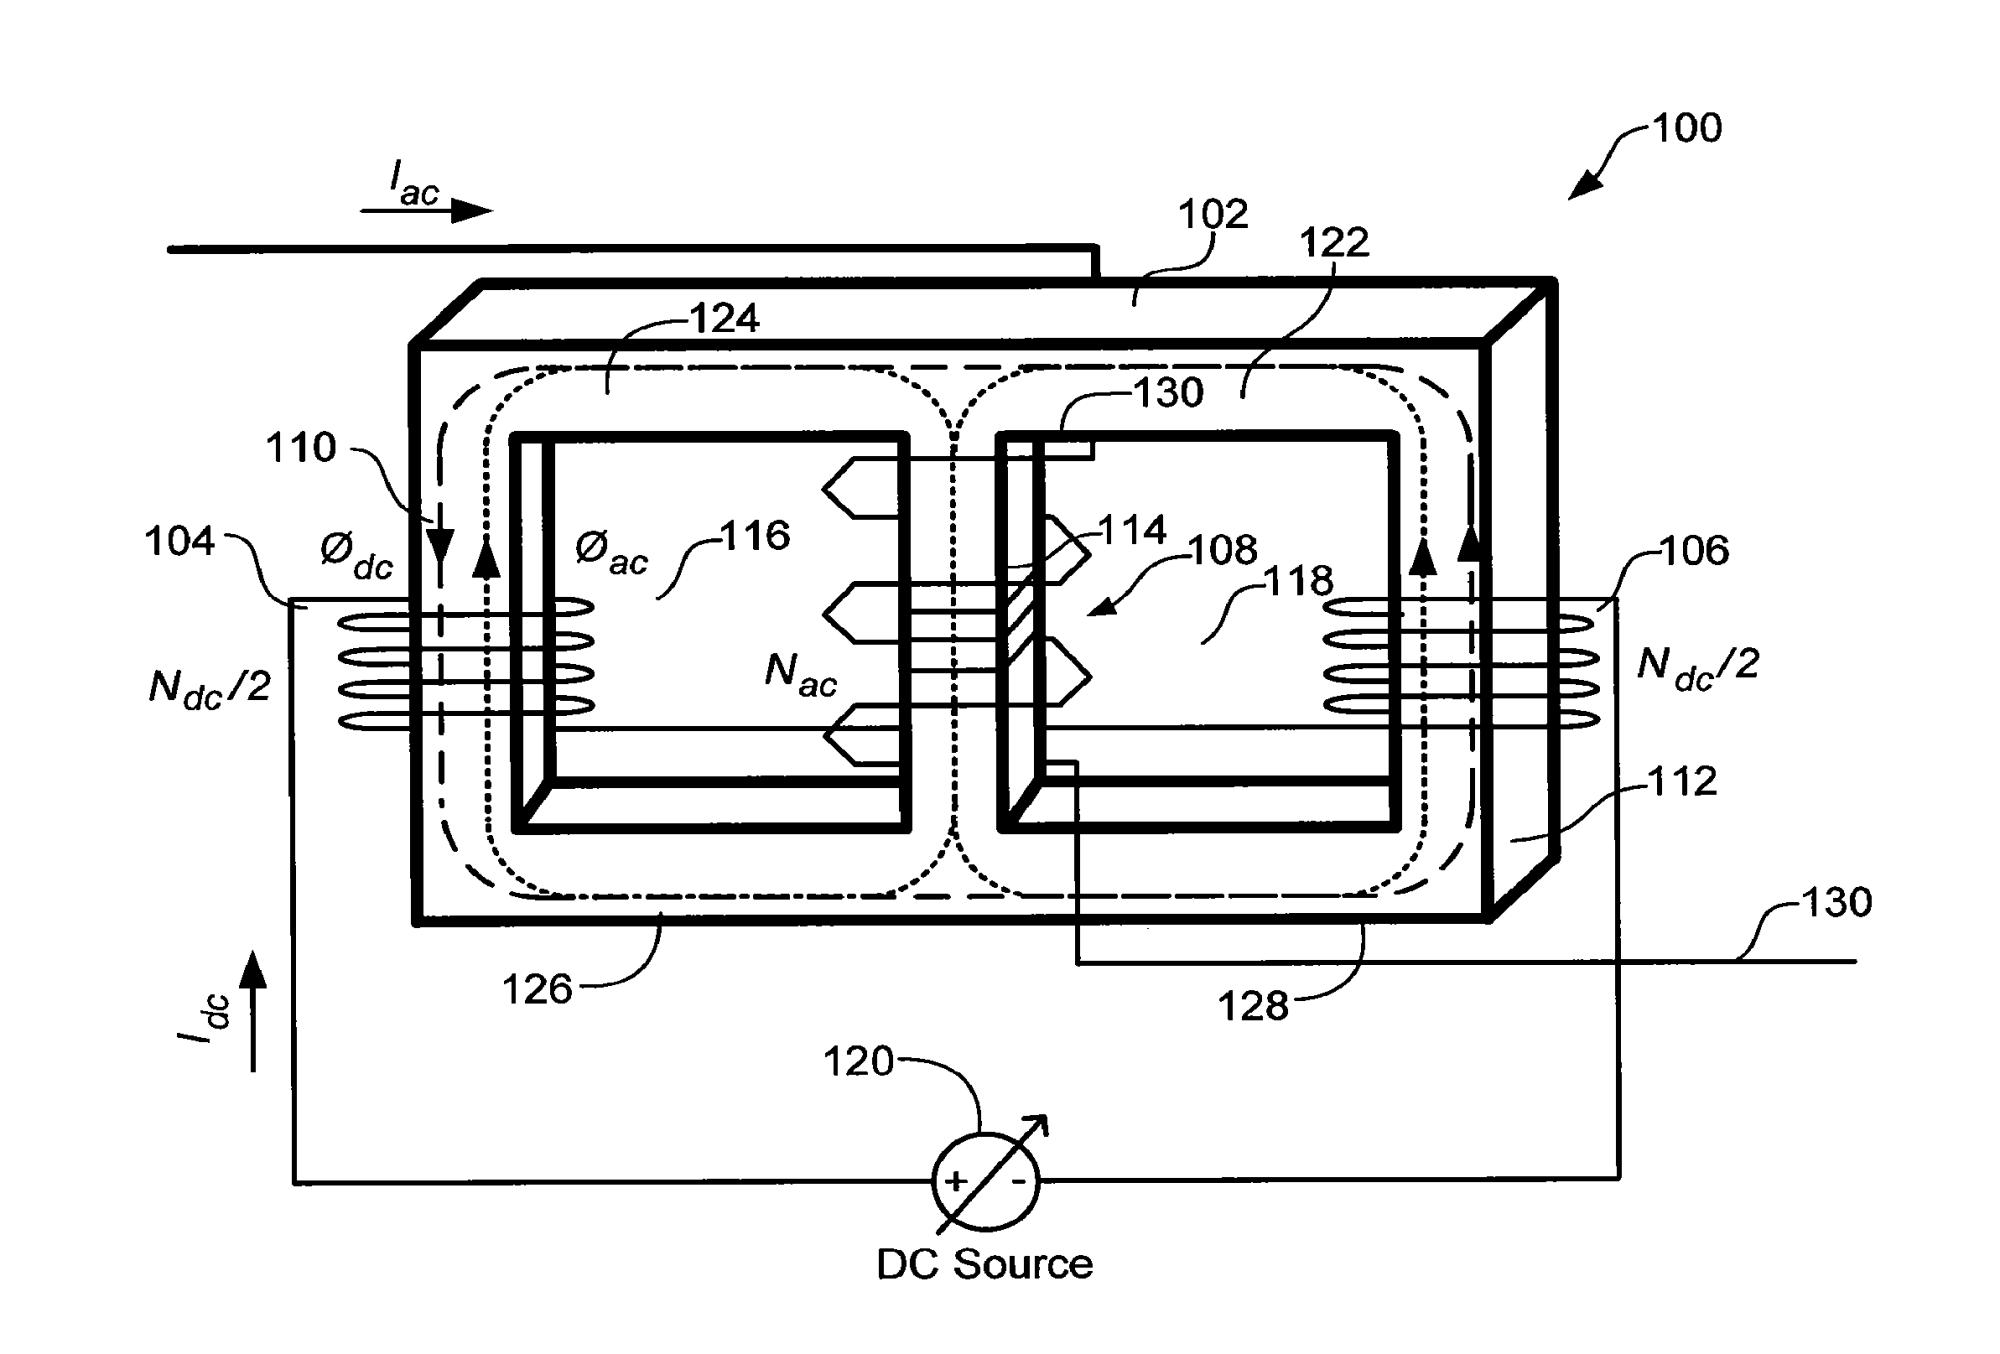 hight resolution of reactor transformer wiring diagram transformer grounding 24 volt transformer wiring diagram 480v transformer wiring diagram